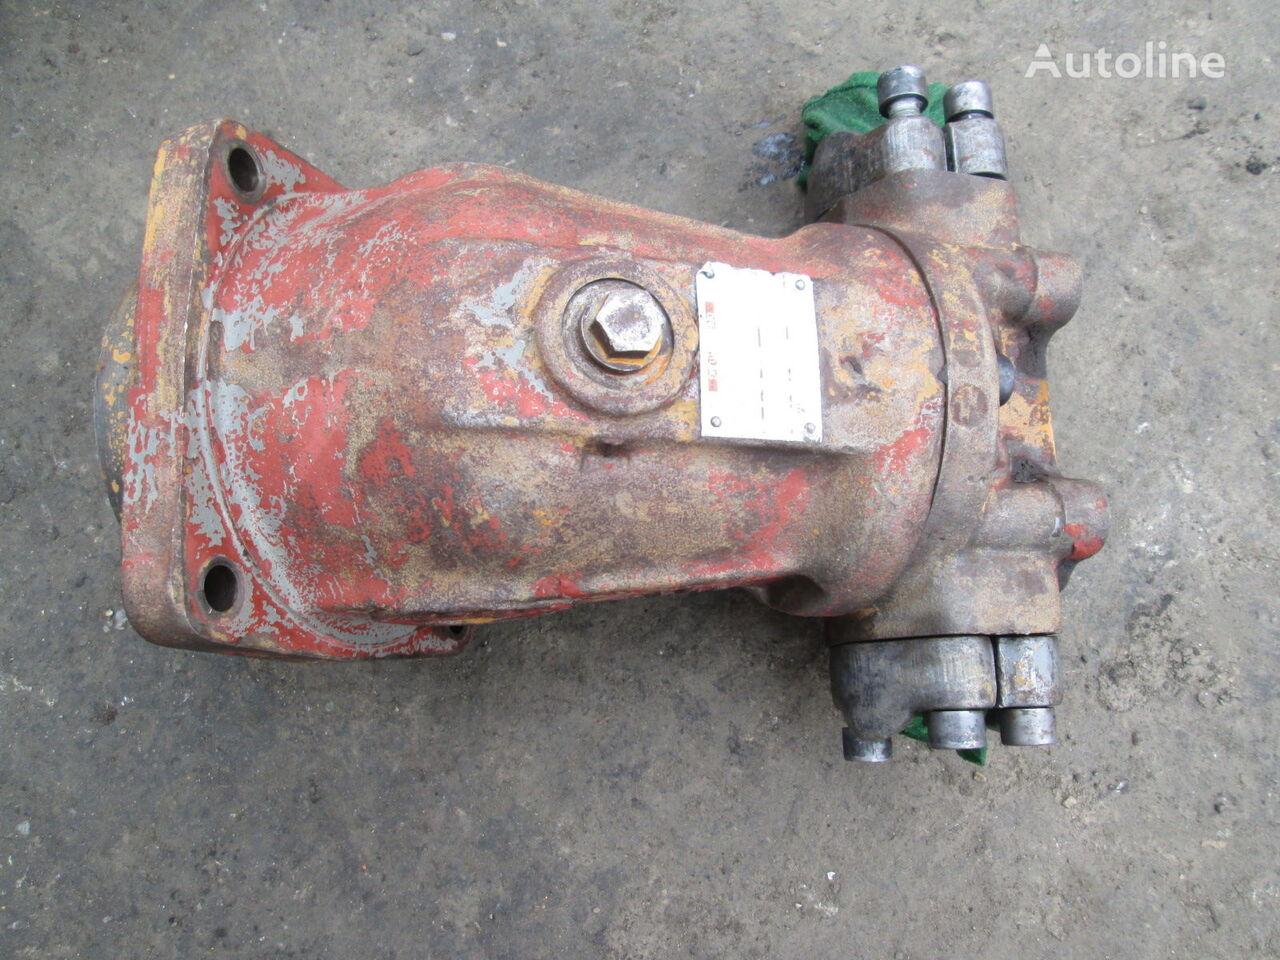 lastikli yükleyici için Hydromatik A2F90W61A2 hidrolik motor